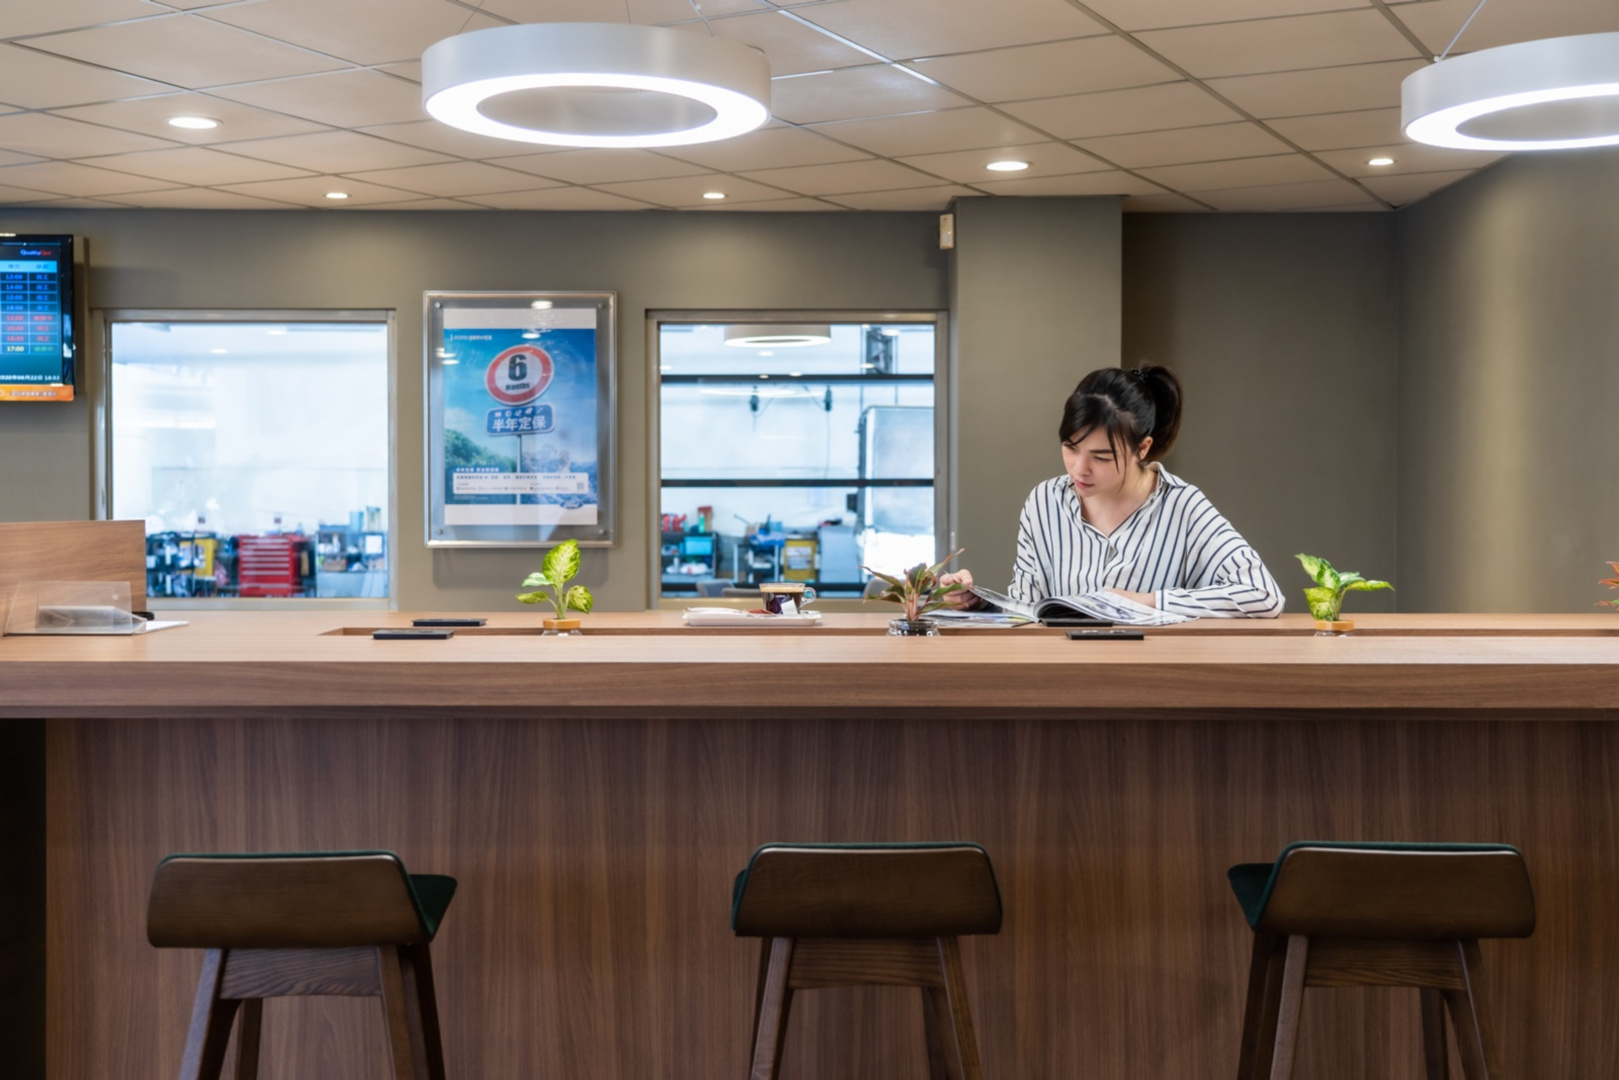 SMALL_【圖七】Ford福彰汽車員林據點全新升級的客休區打造明亮與舒適的休憩空間